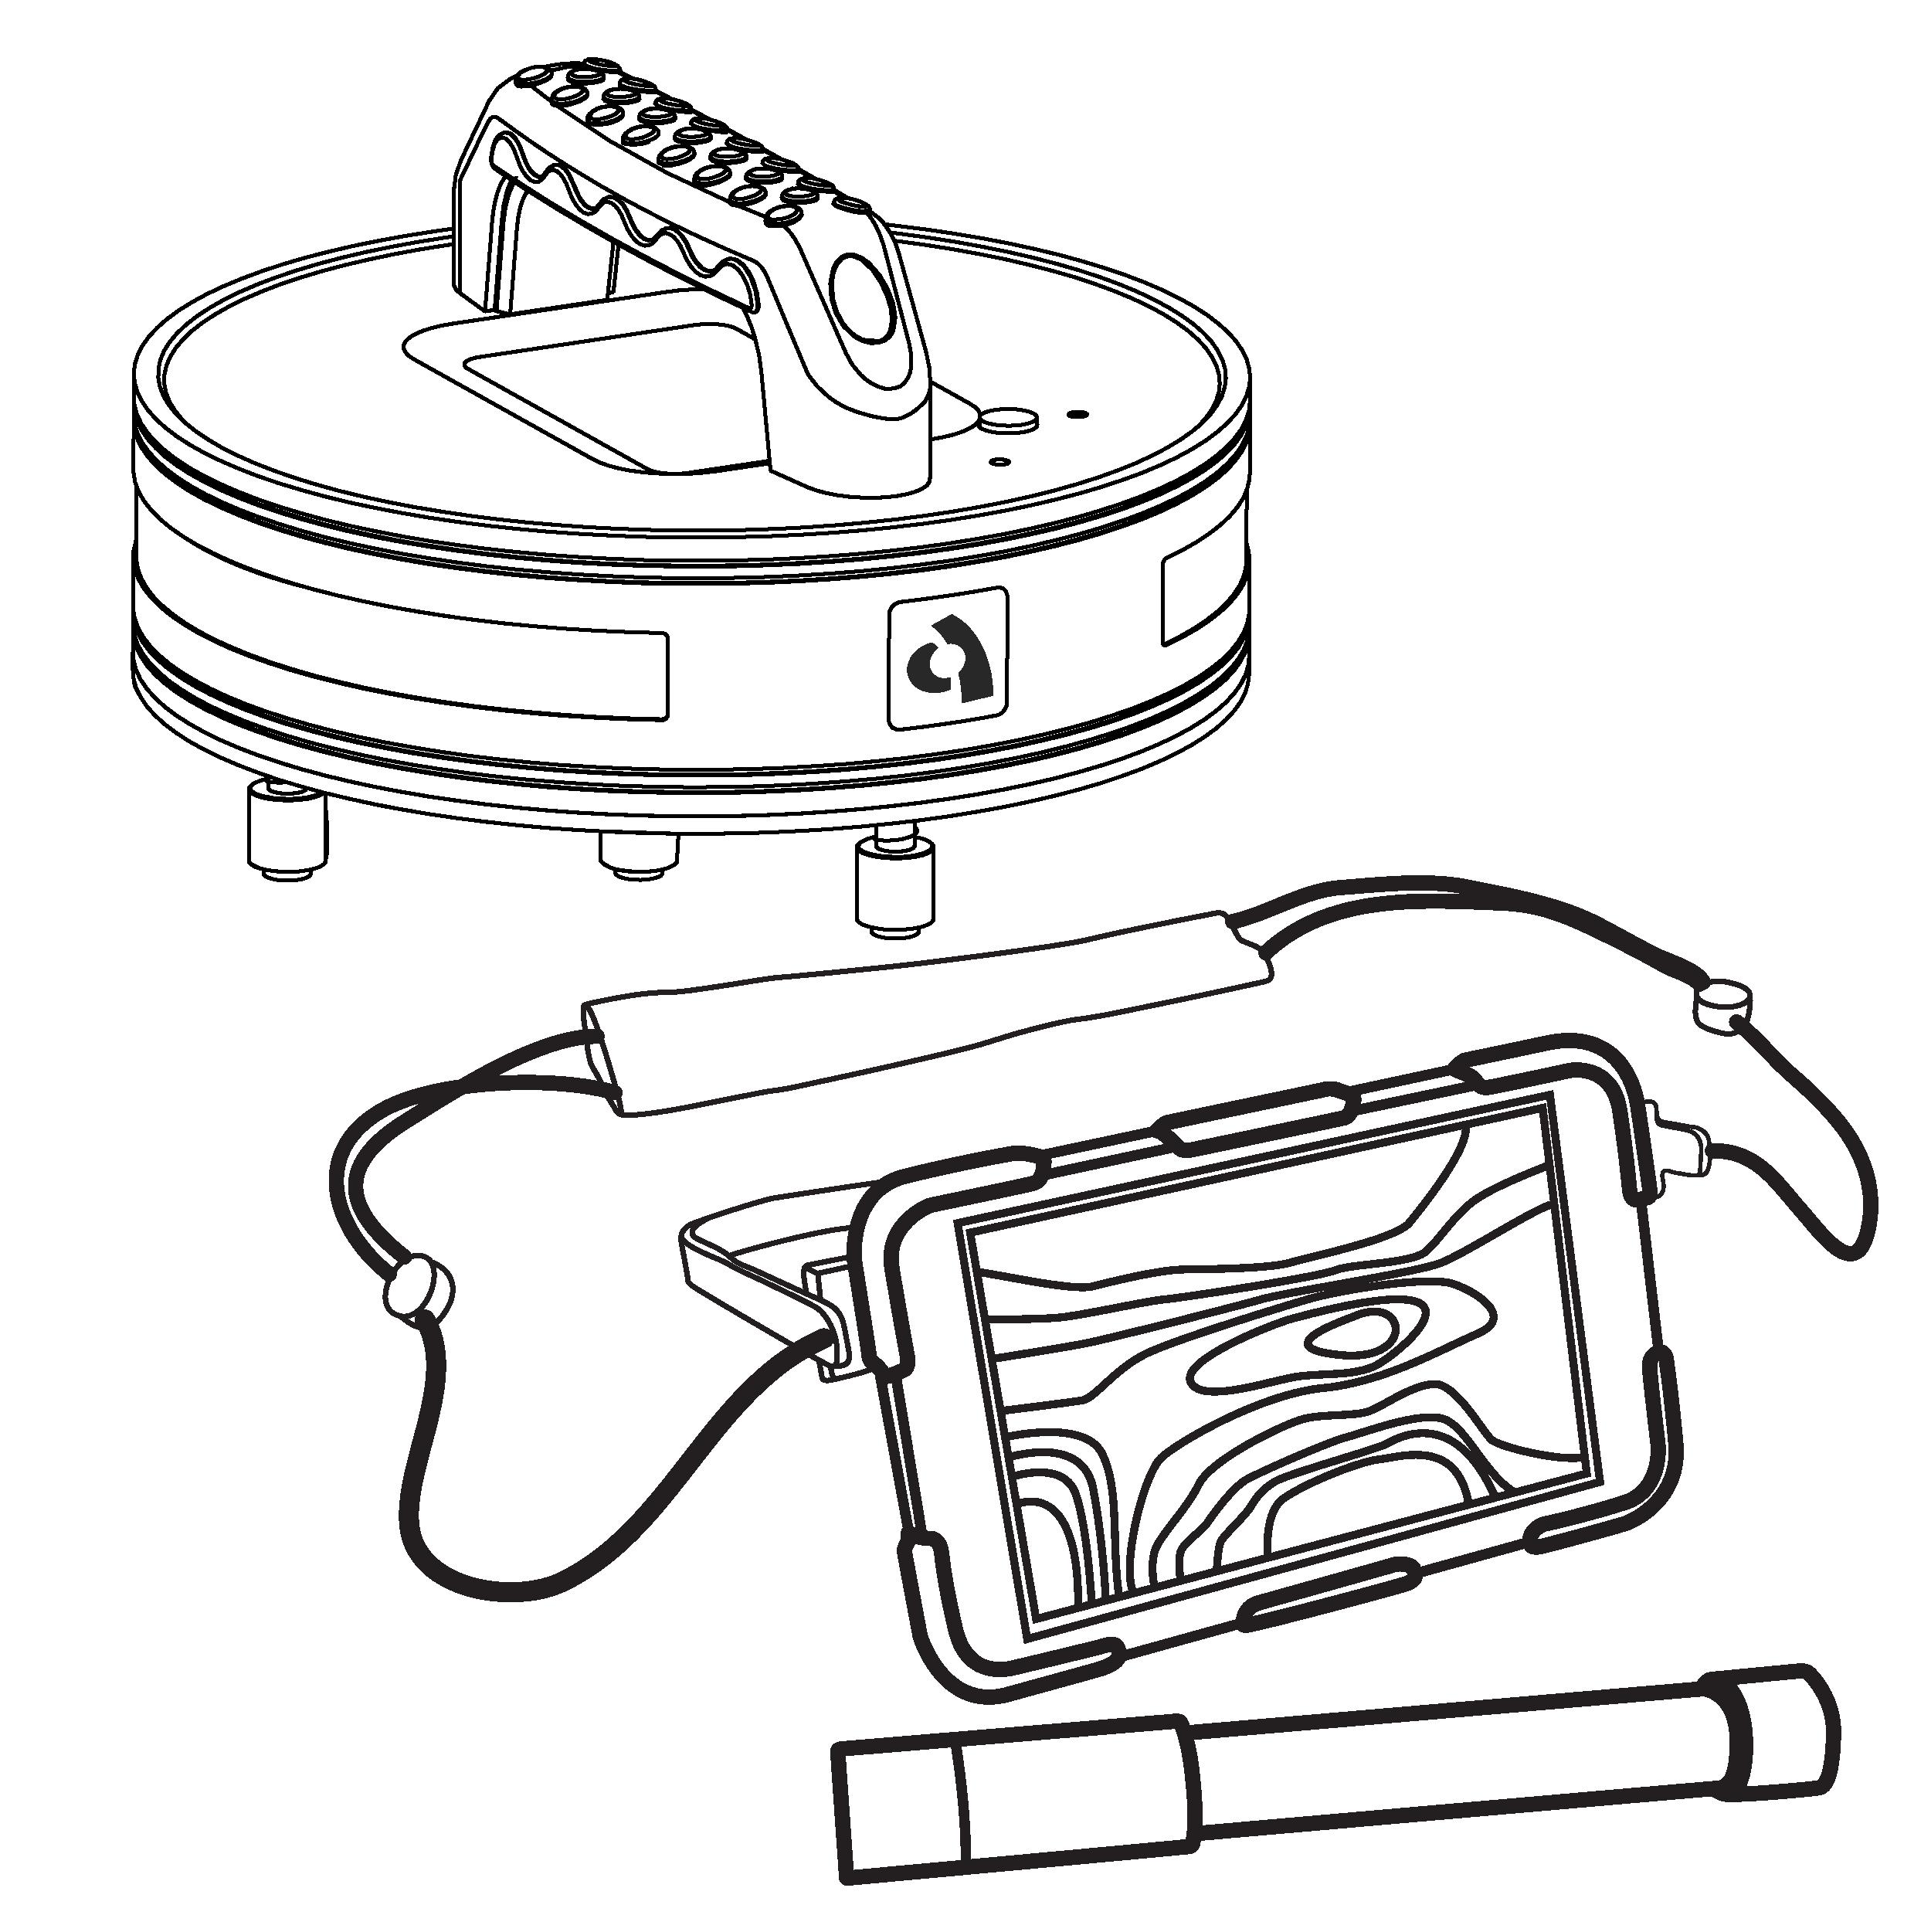 Equipment Trace-01